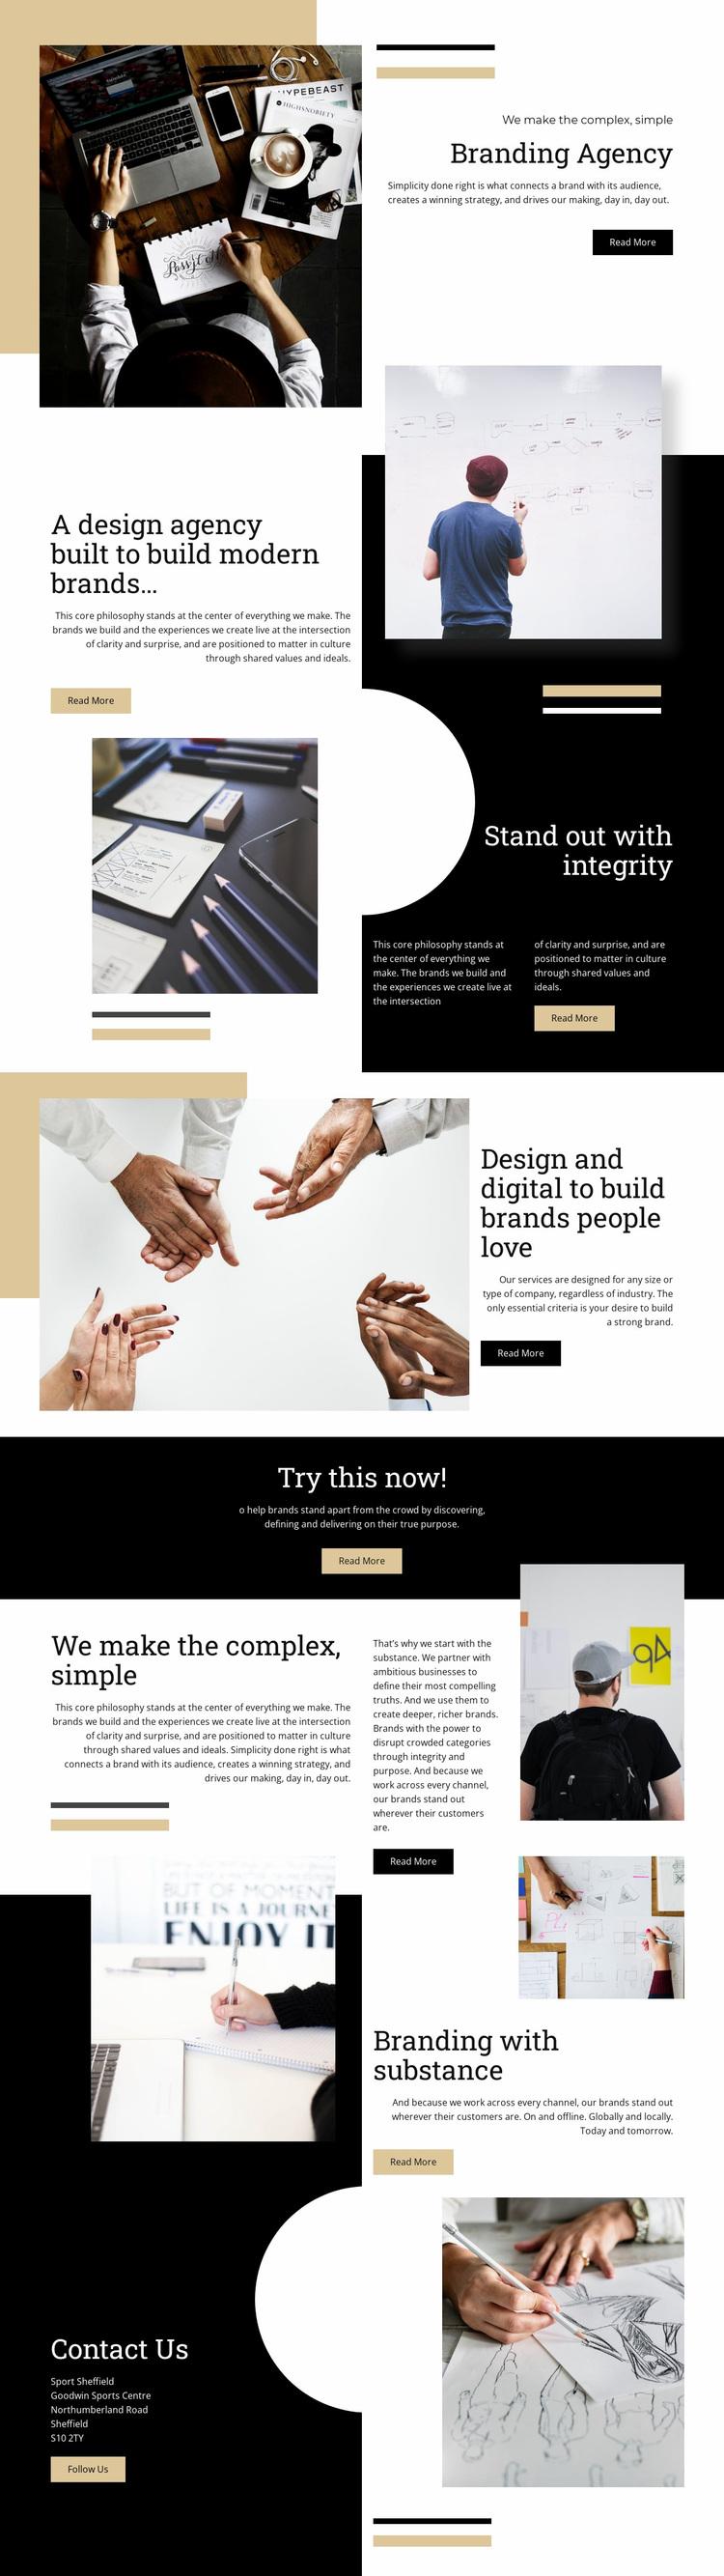 Branding Agency Website Design